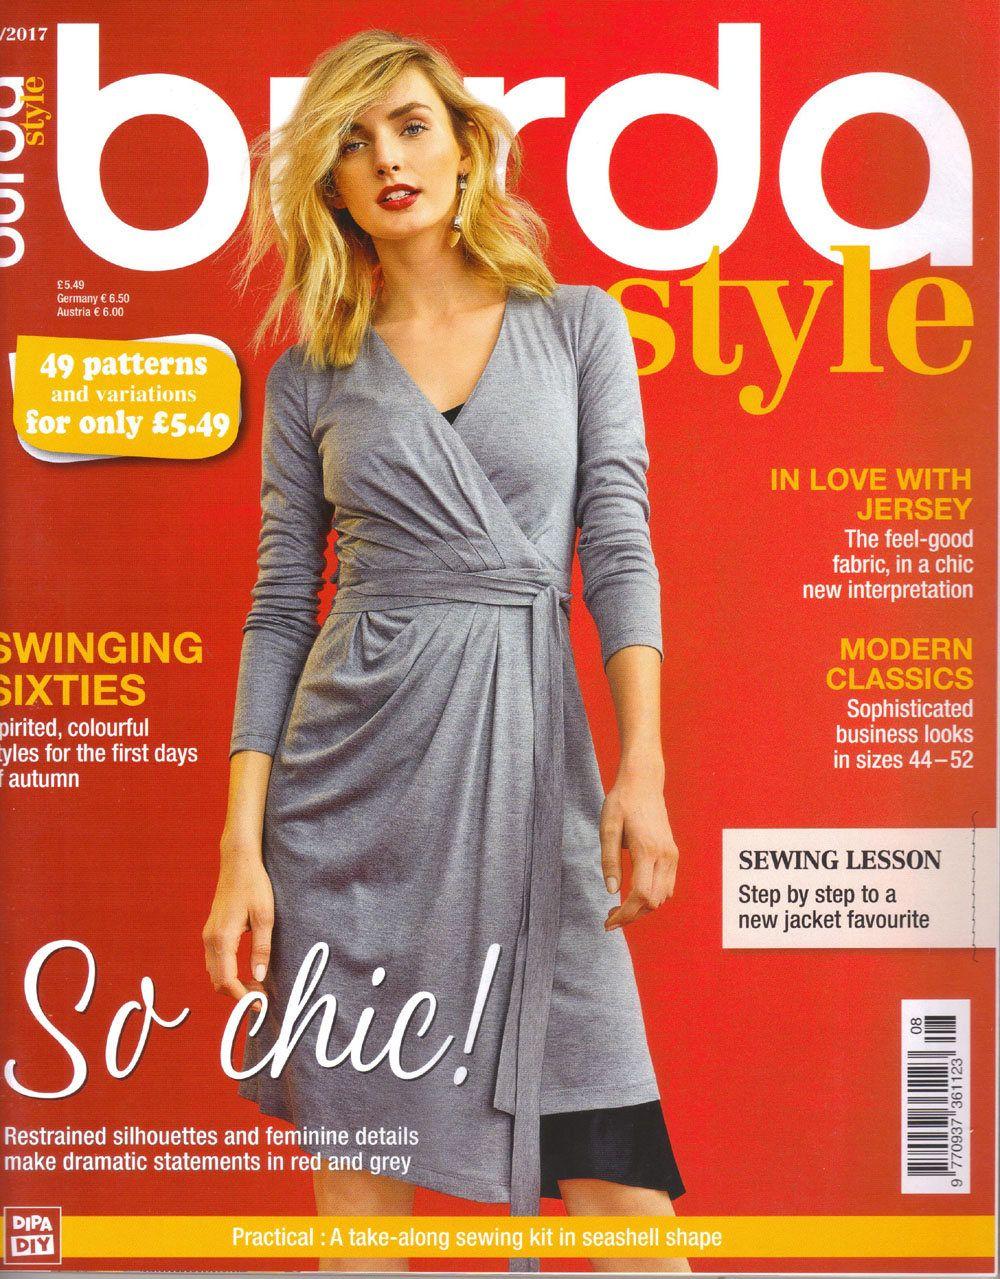 Burda style magazine 82017 english sewing patterns by burda style magazine 82017 english sewing patterns by honeyjamsuniques on etsy jeuxipadfo Image collections